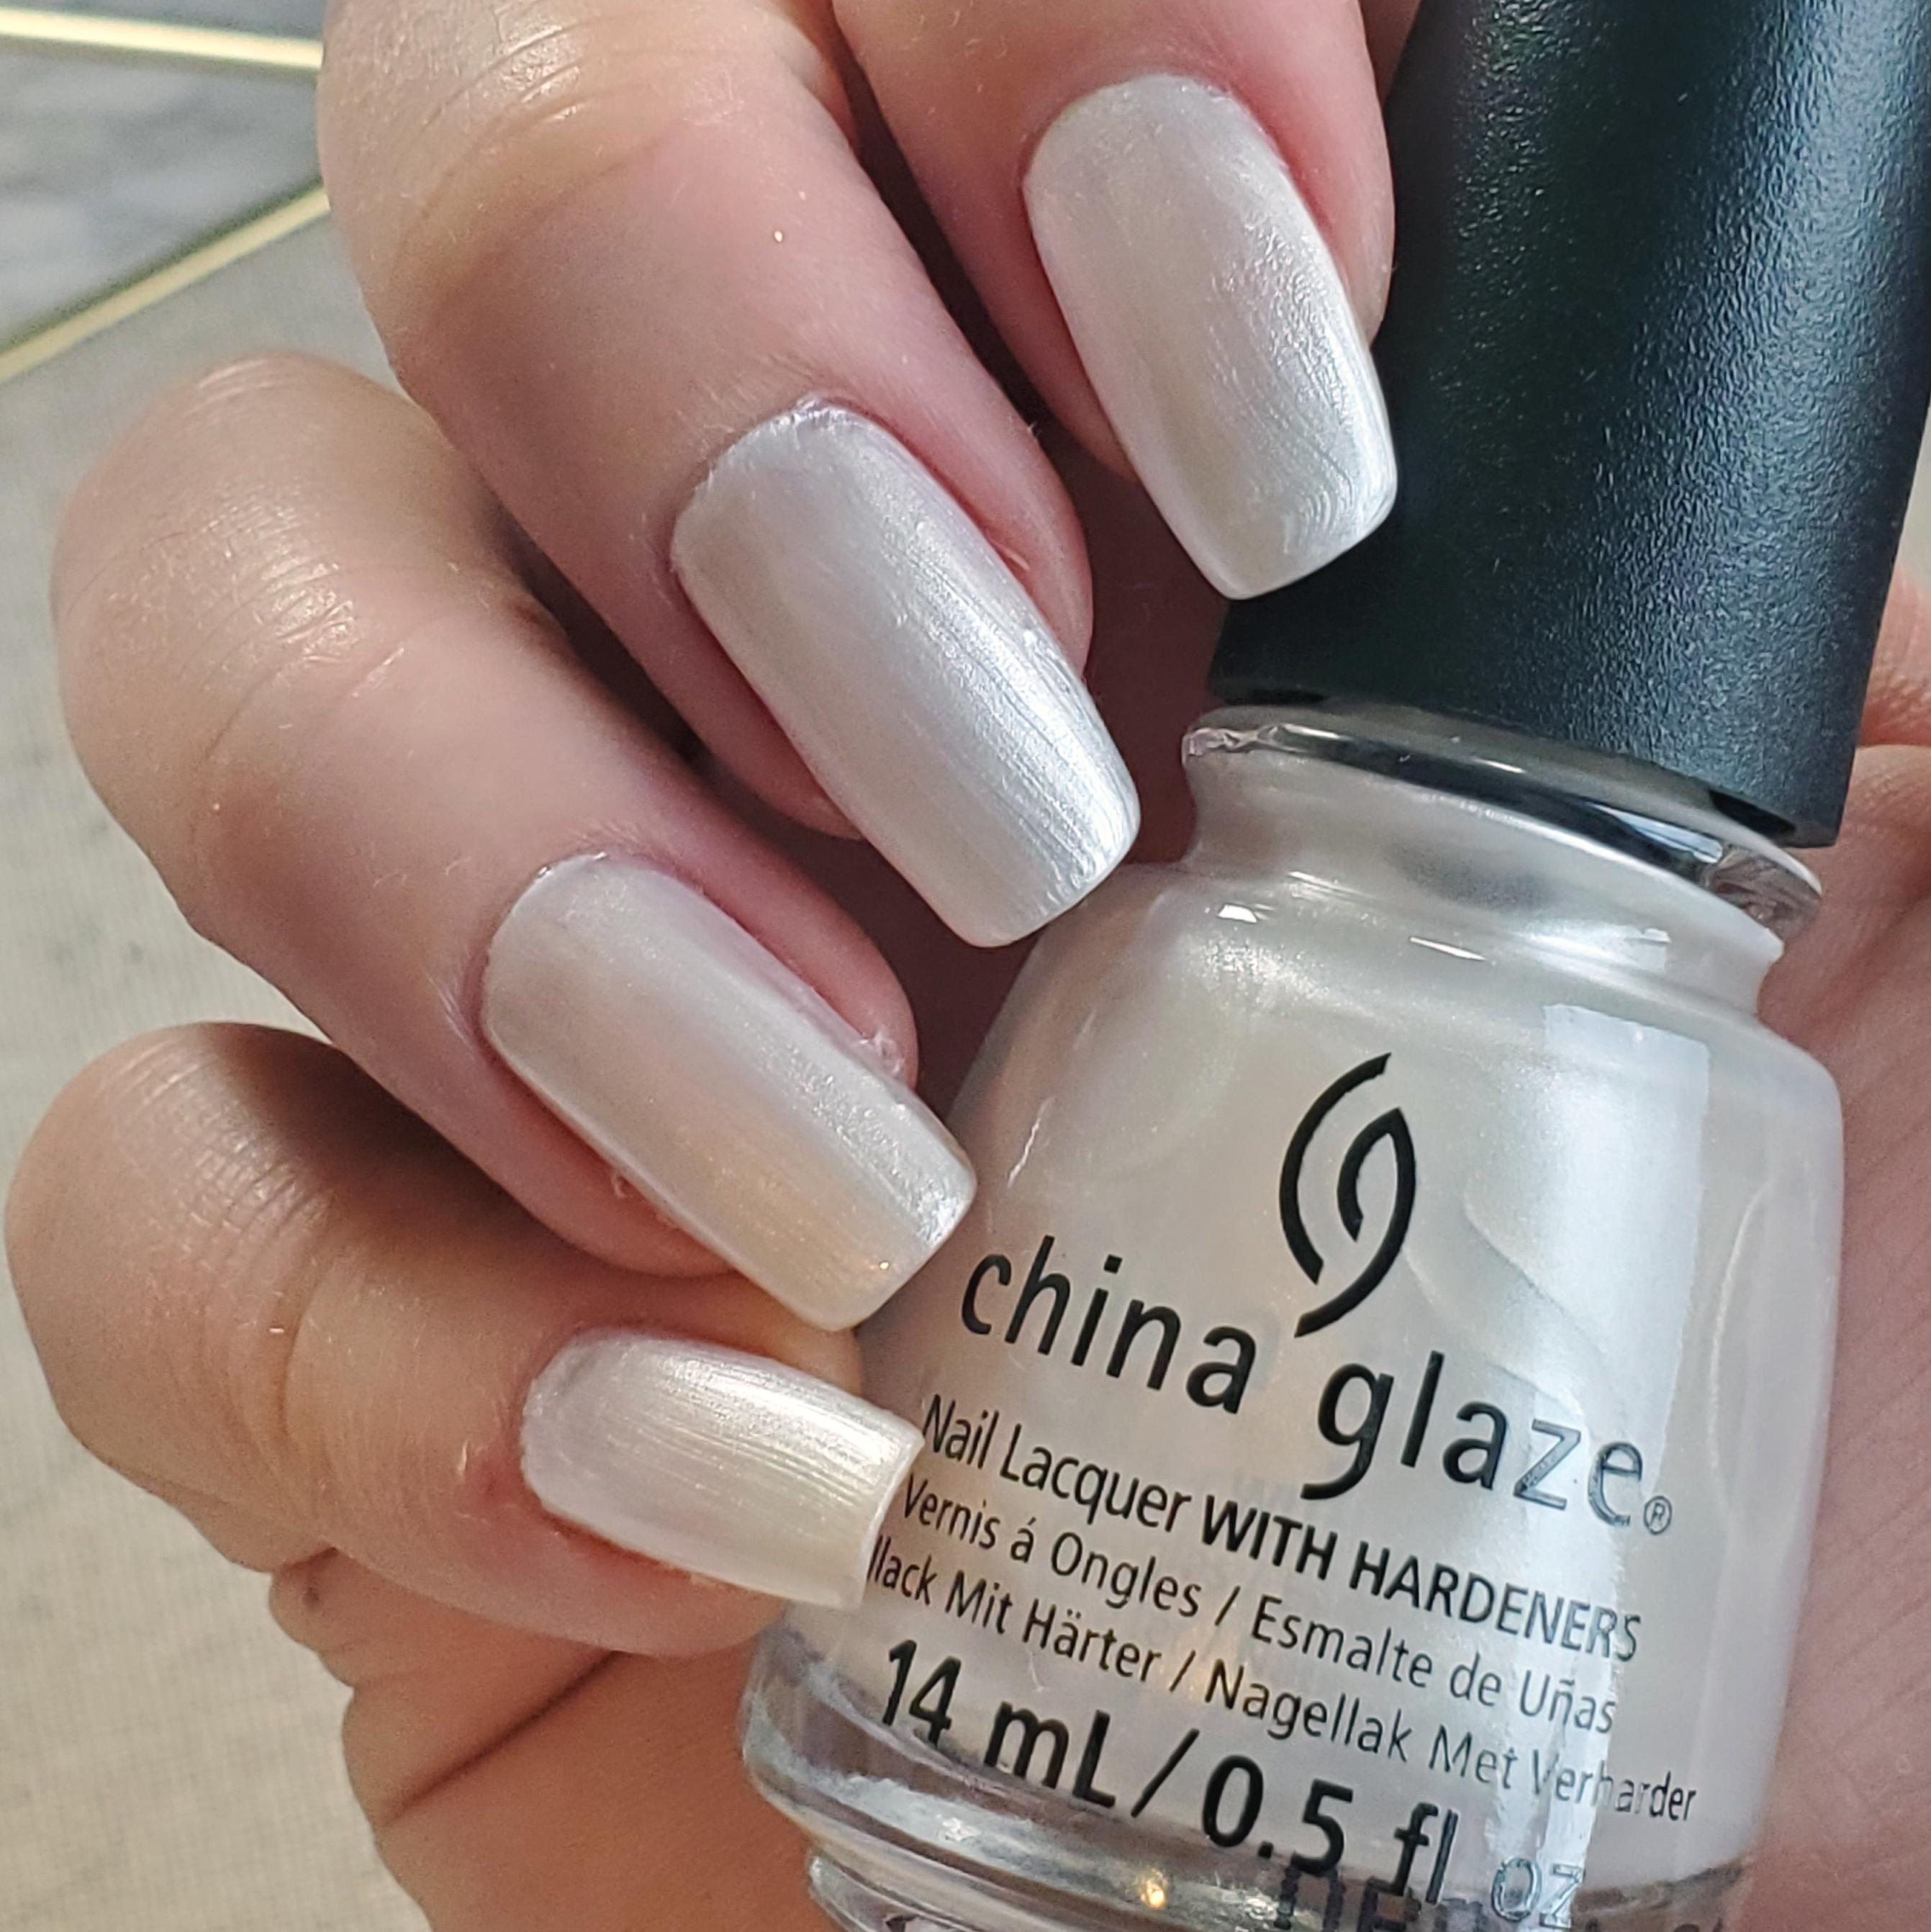 Manicure Monday - China Glaze White Hot Summer 2020 Collection